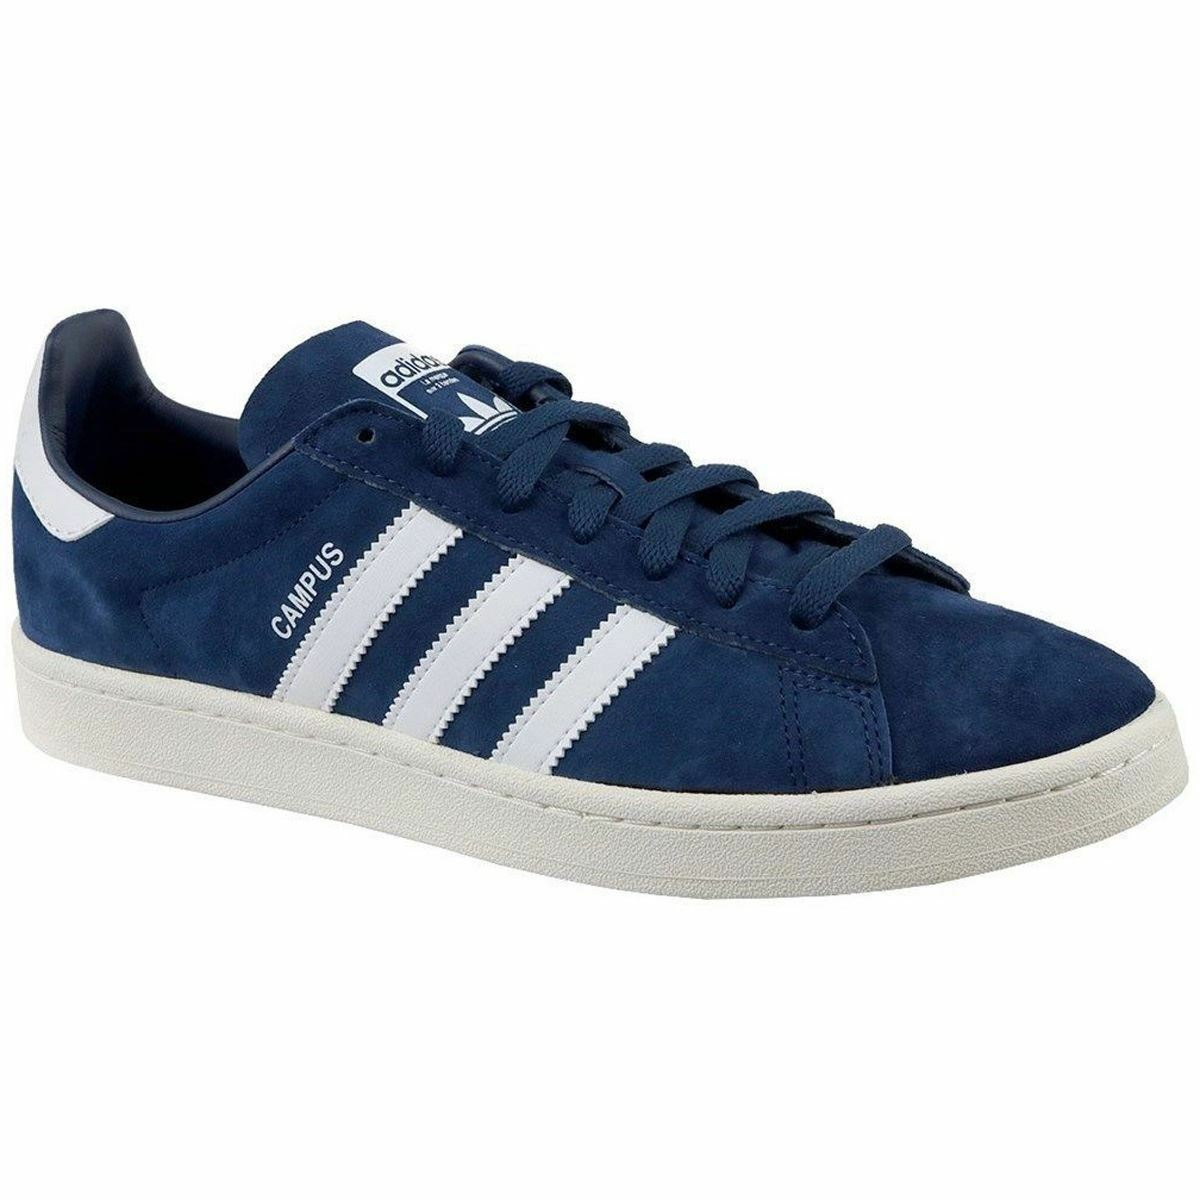 Adidas Campus Σκούρο μπλΡ παπούτσια ΛΡυκΞ� Mens Nubuck Low-top Αθλητικά παπούτσια